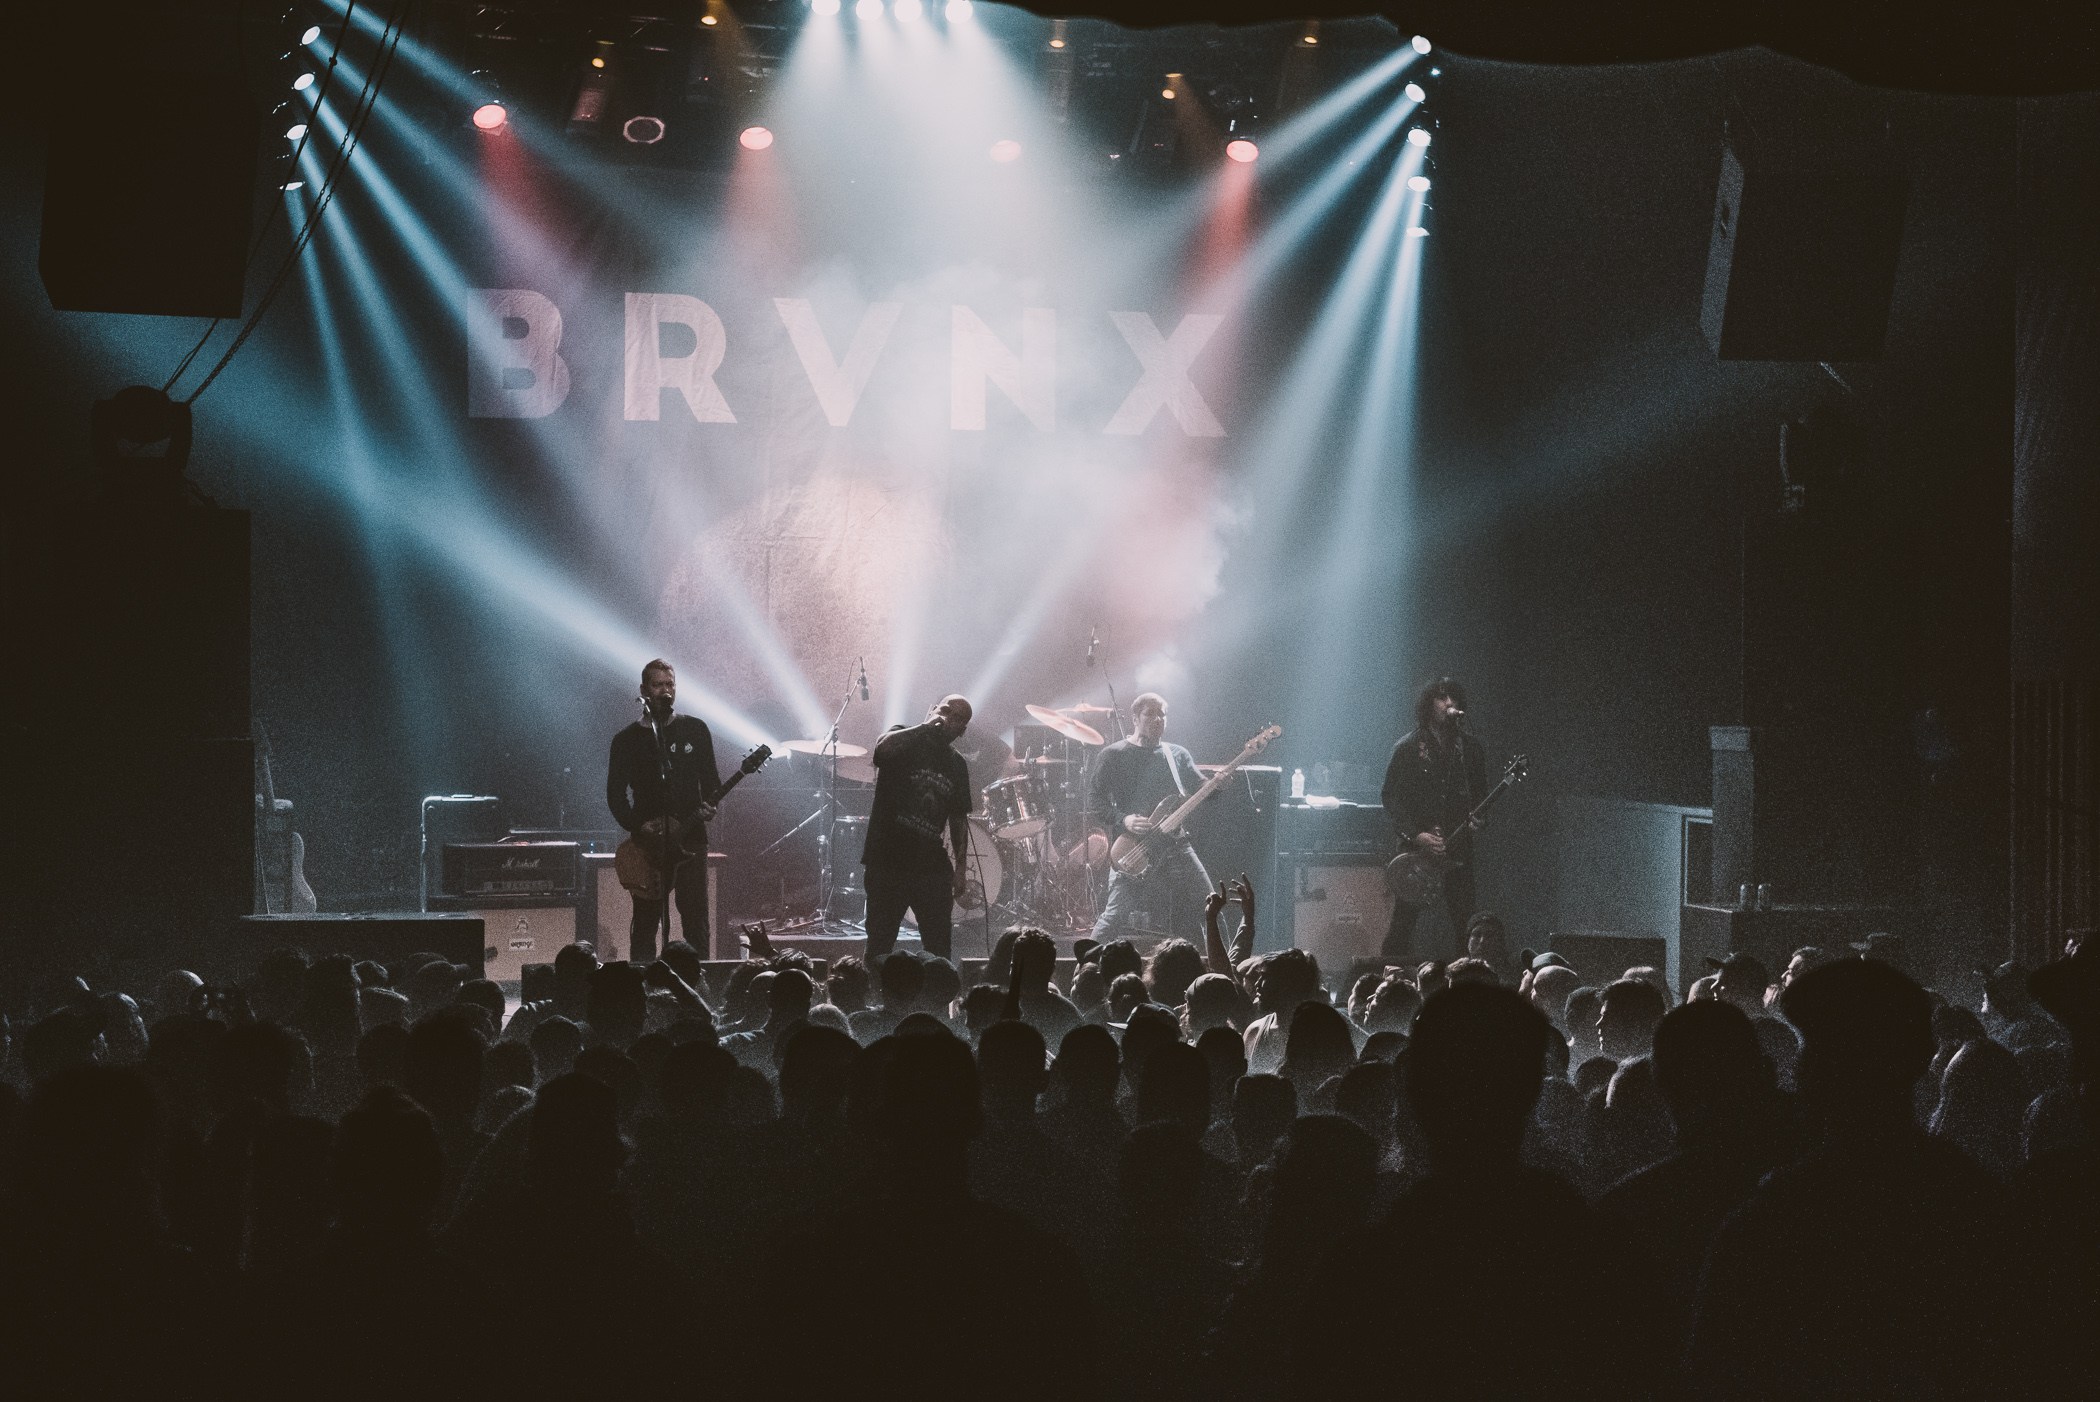 1_The_Bronx-Rickshaw_Theatre-Vancouver_Timothy_Nguyen-20180402 (52 of 52).jpg